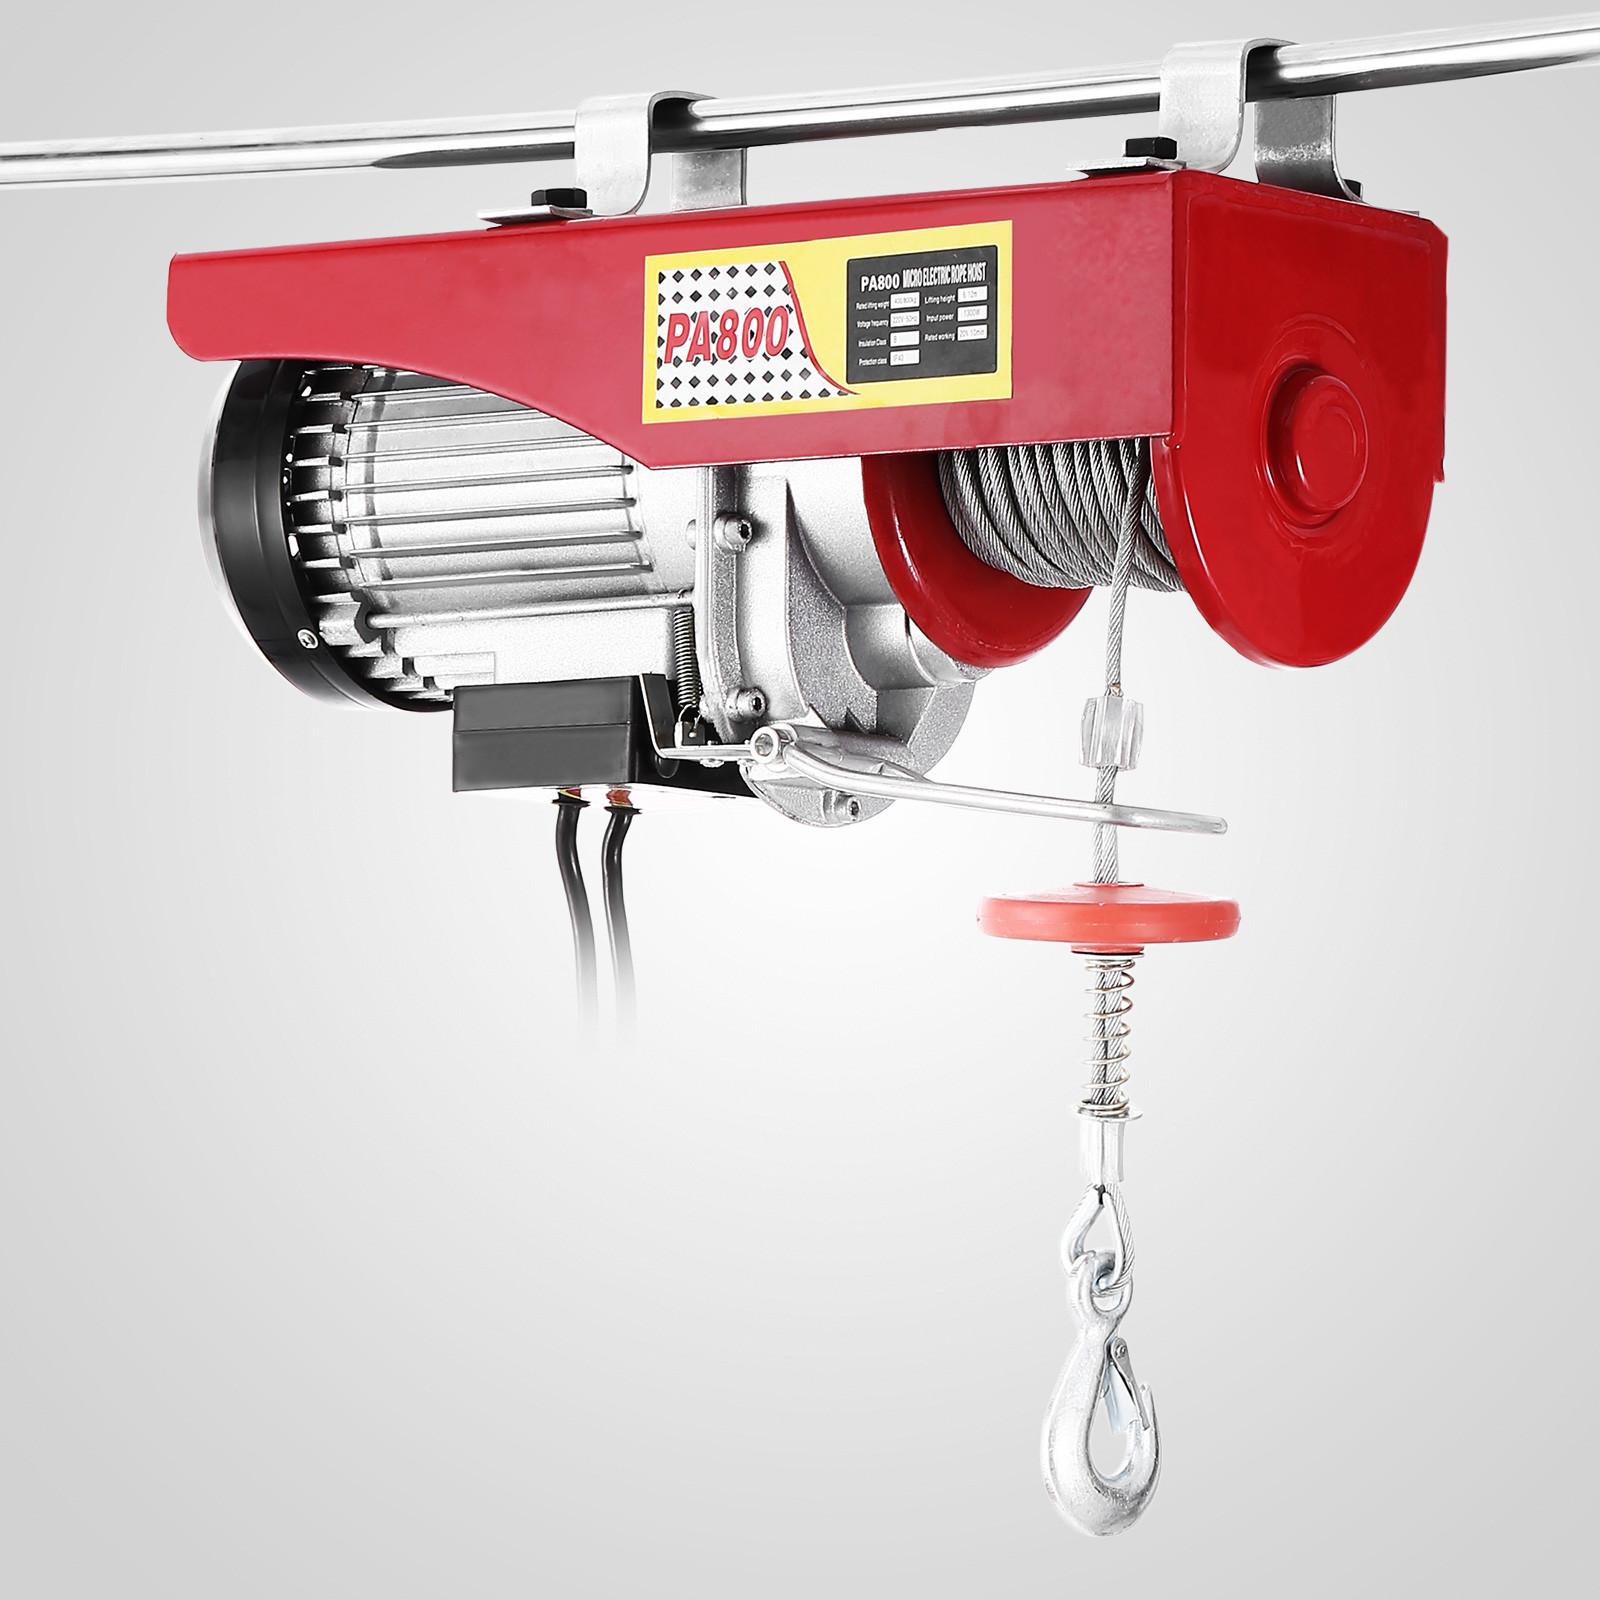 100kg-900kg-Electric-Hoist-Winch-Lifting-Engine-Crane-Cable-Lift-Hook-Garage miniature 51